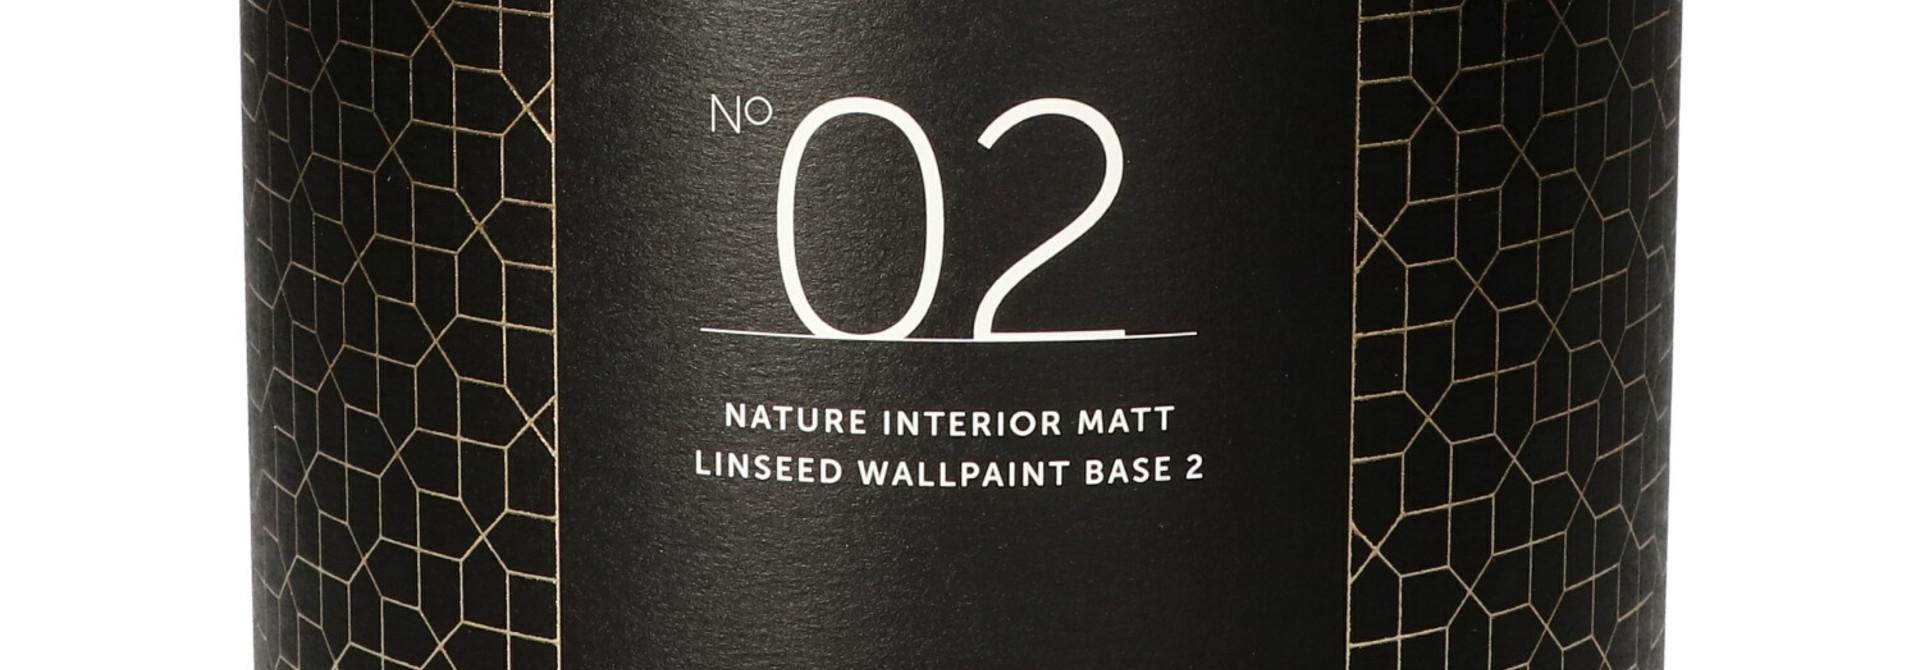 No. 02 NATURE INTERIOR MATT LINSEED WALLPAINT